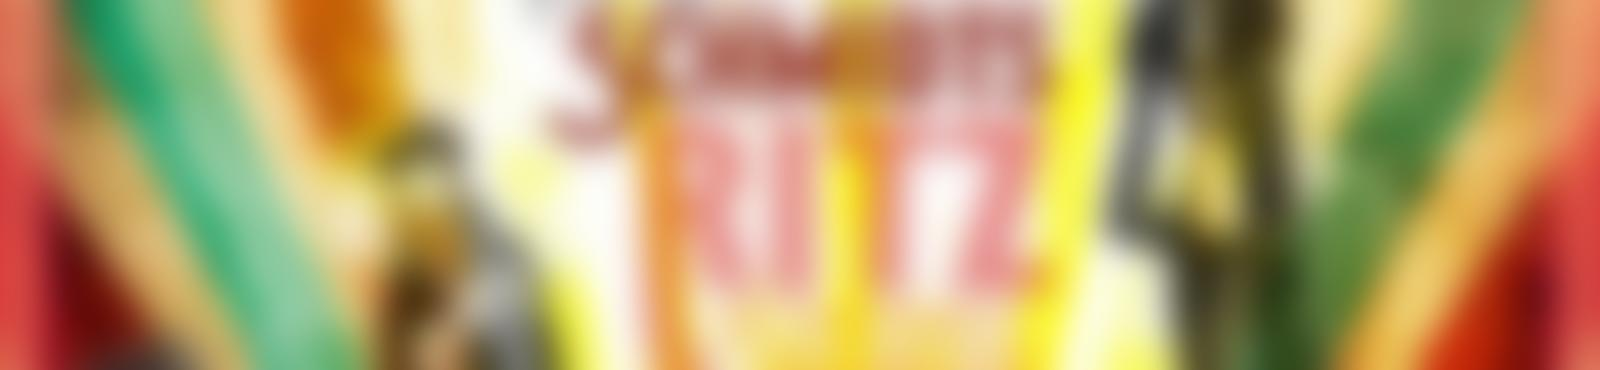 Blurred 4141b5a1 5dcc 4872 b782 43d06a00139a